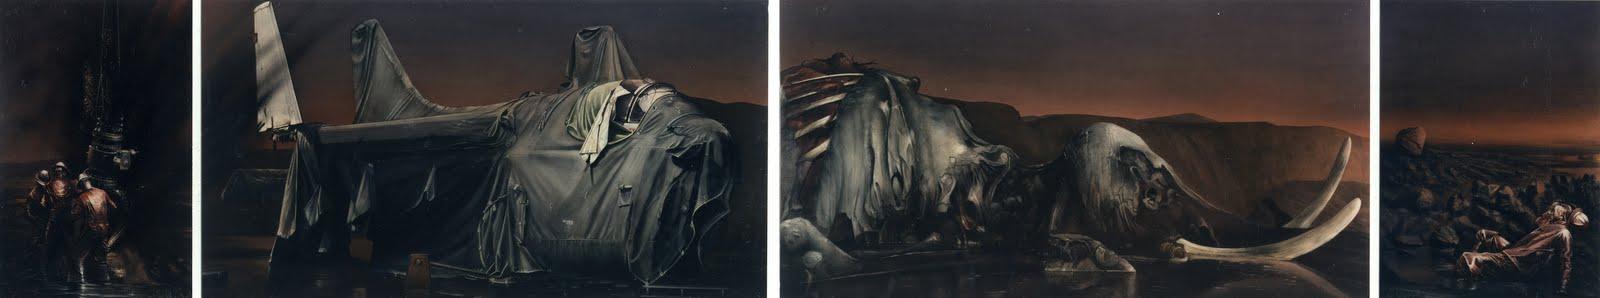 Oel   1995   Aquarell   4-teilig   69 x 348 cm